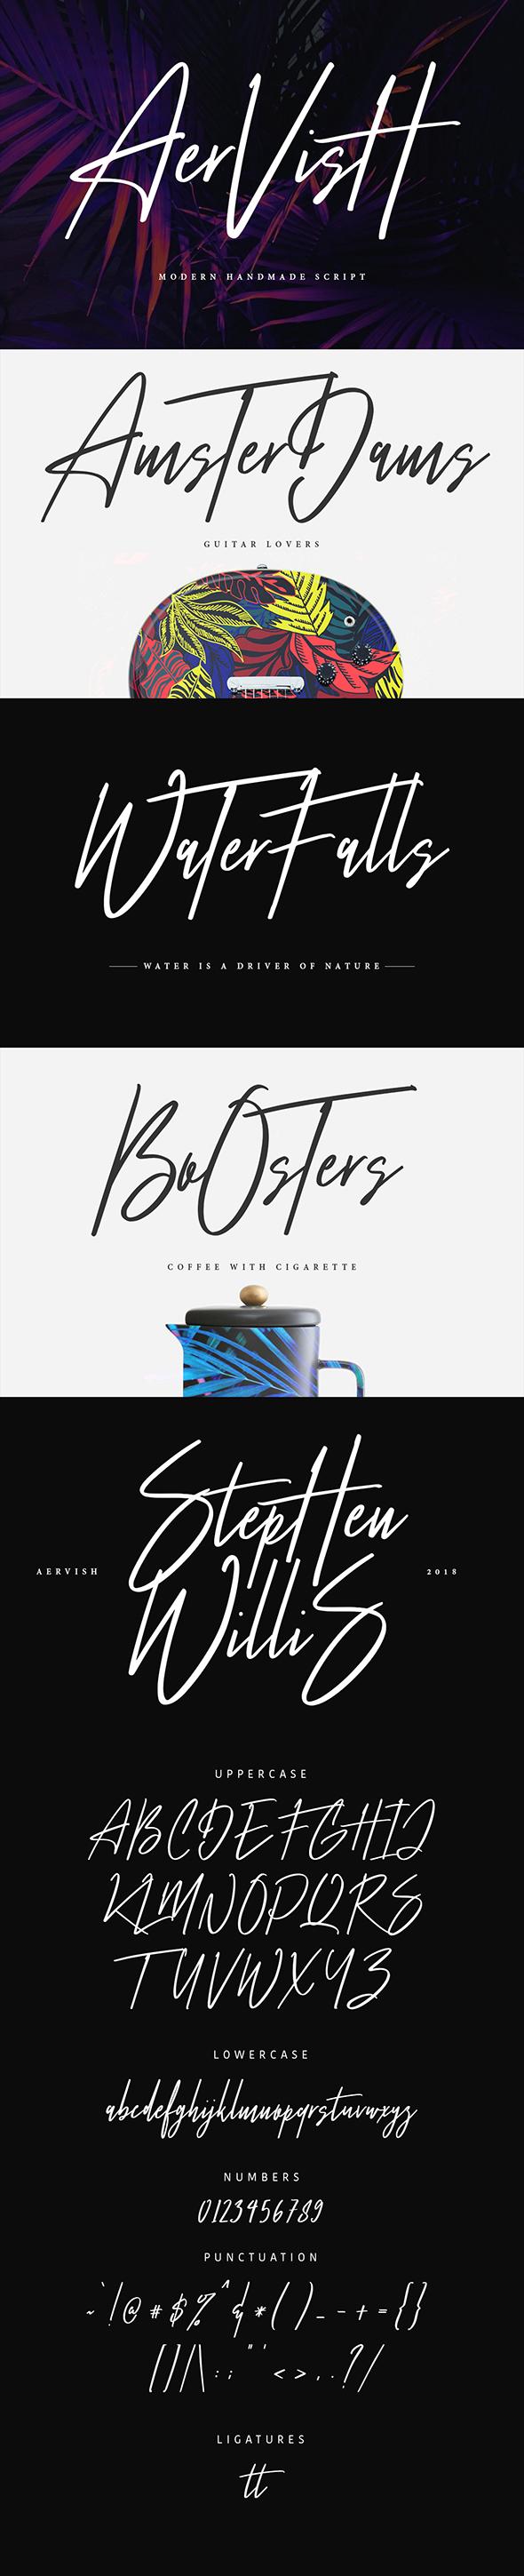 Aervish Typeface - Calligraphy Script